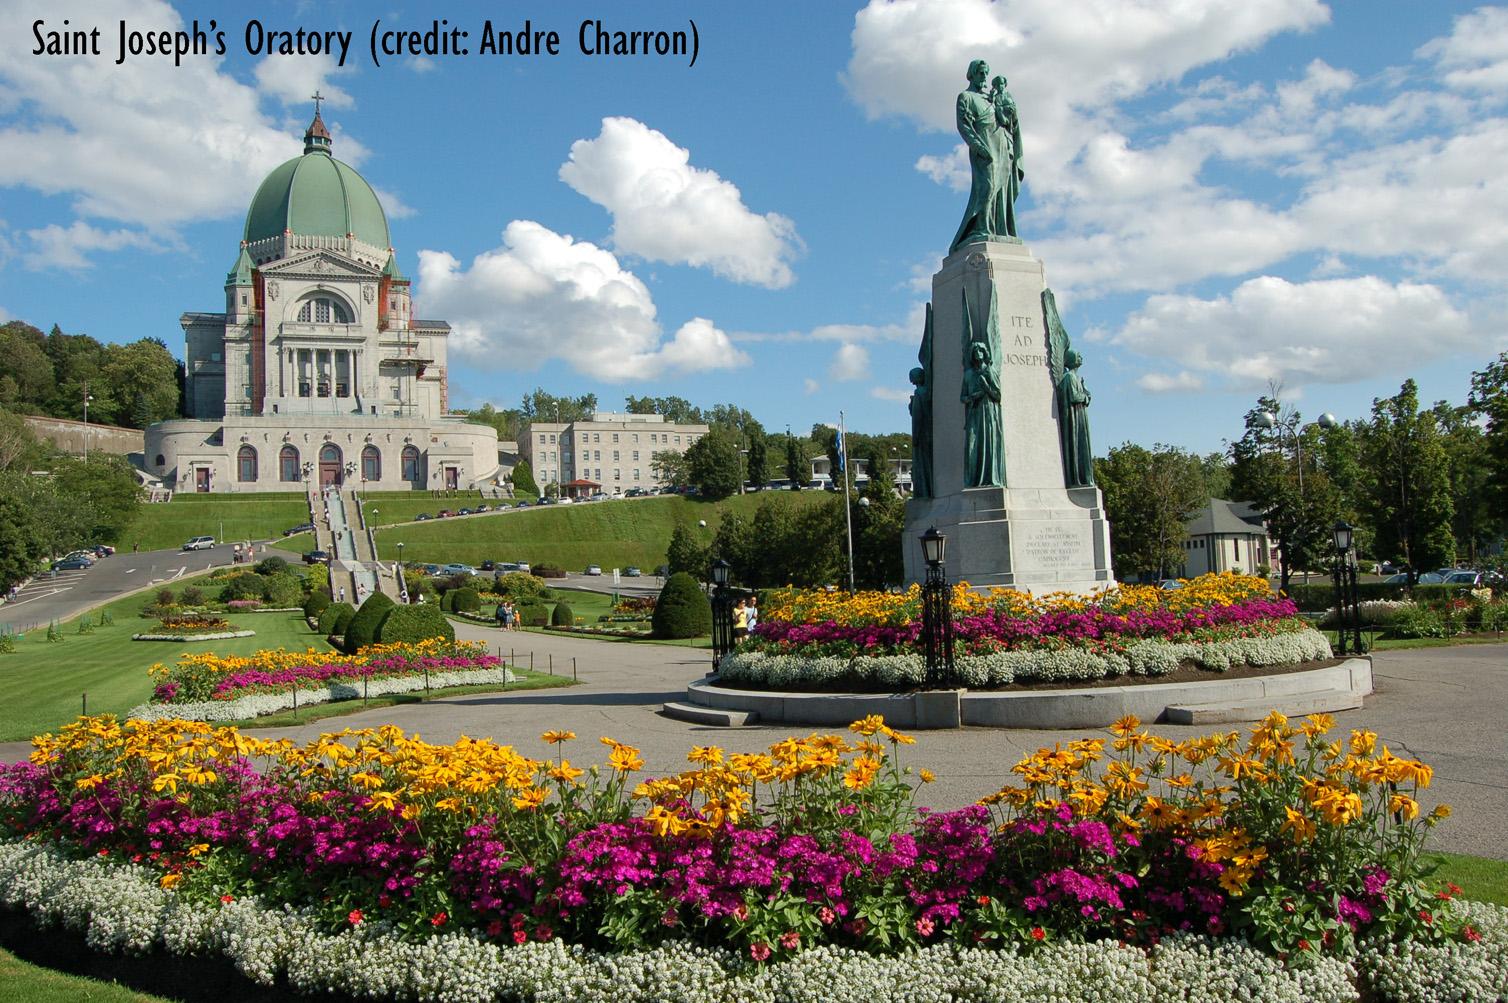 St Joseph's Oratory (credit: Andre Charron)